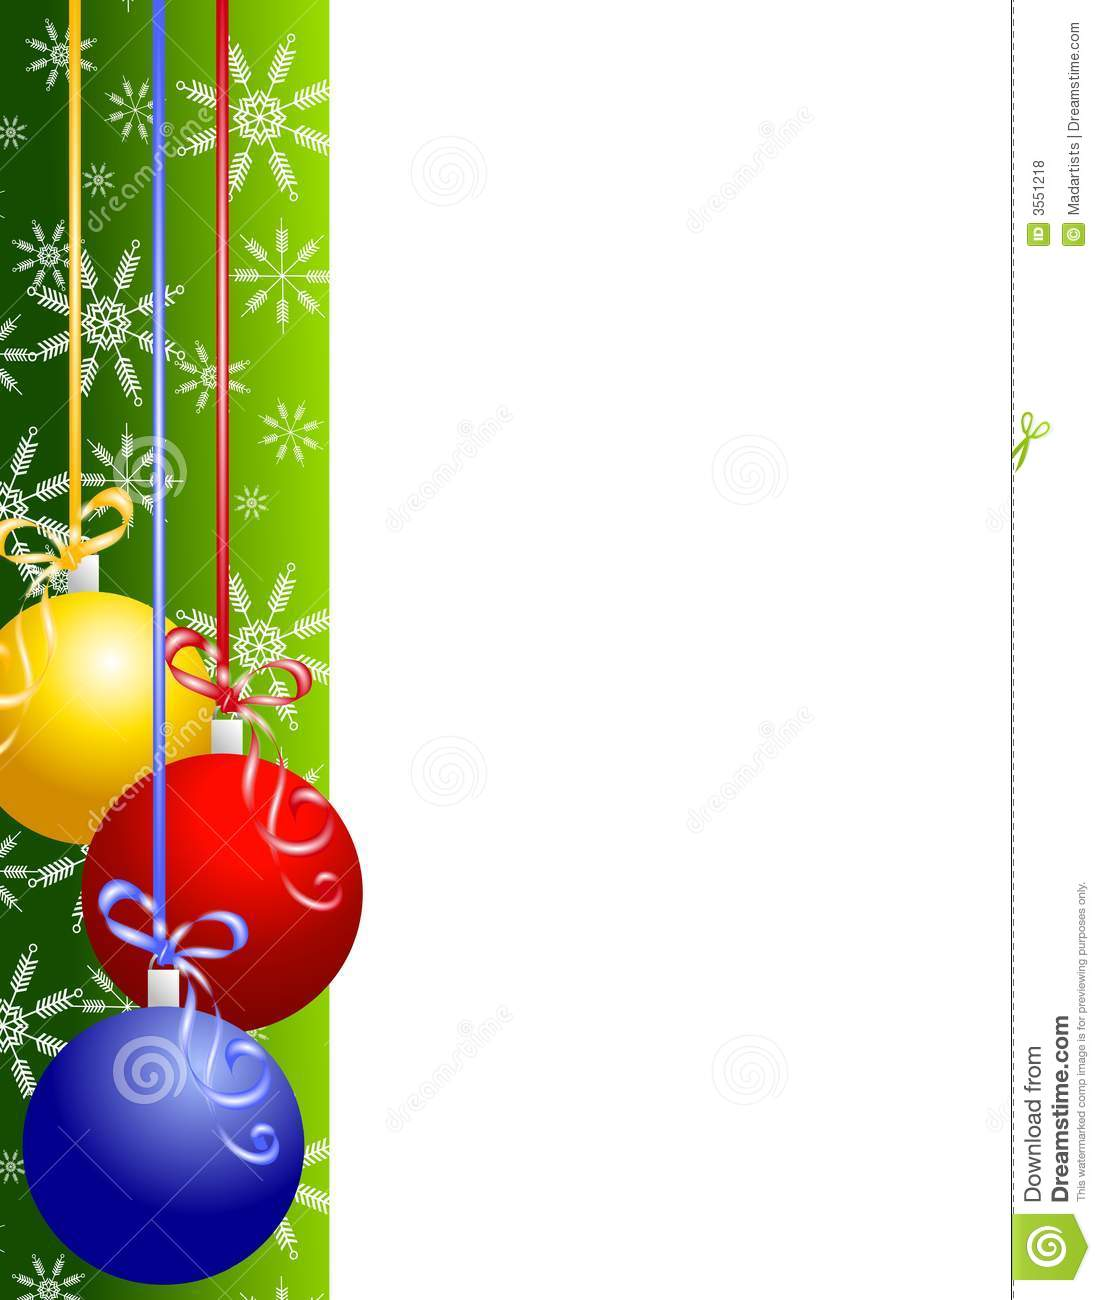 Christmas Clipart Borders-christmas clipart borders-3